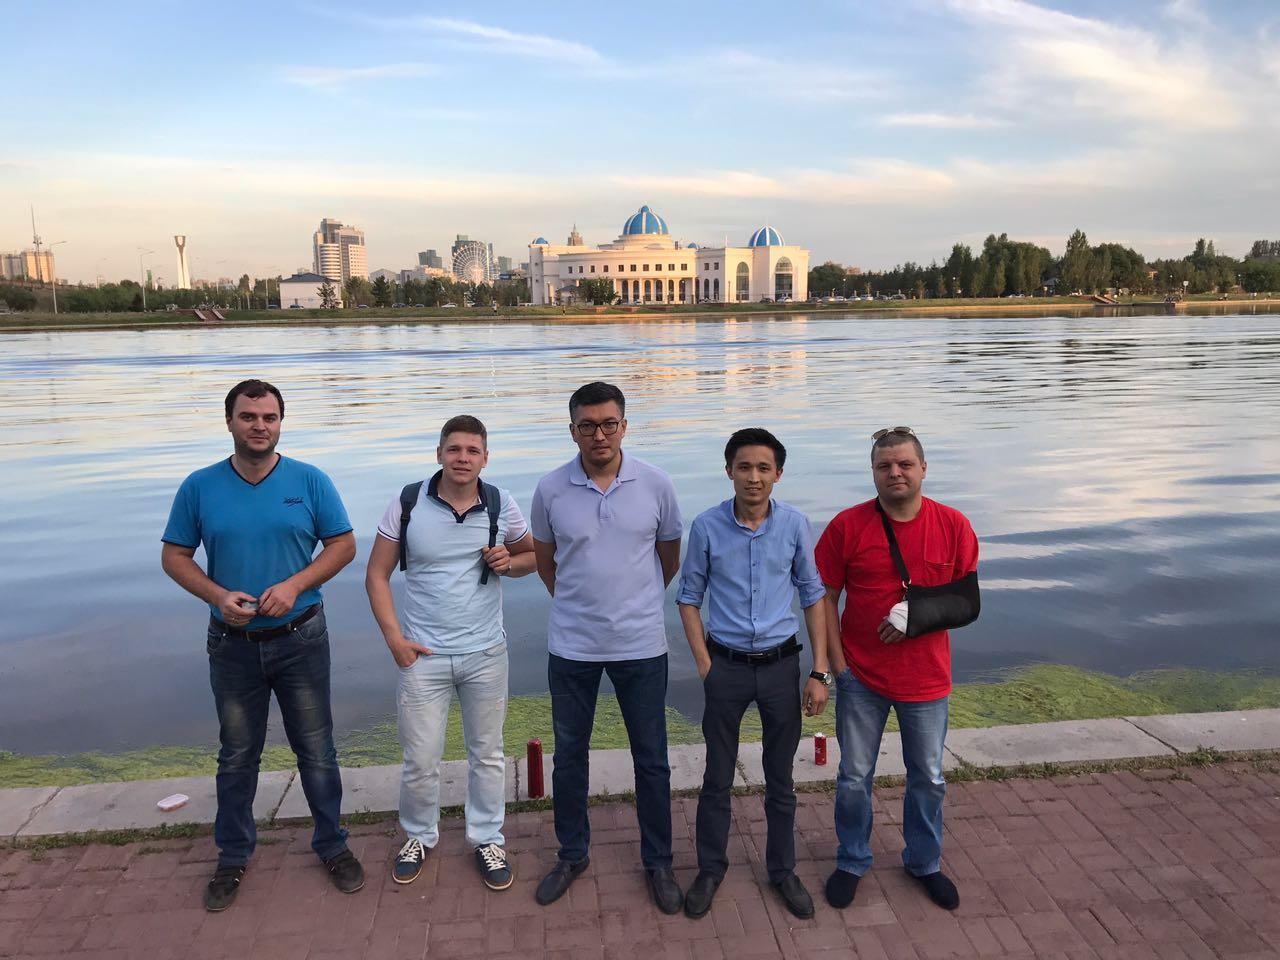 Встреча 22 июня на набережной с представителем клуба из Красноярска